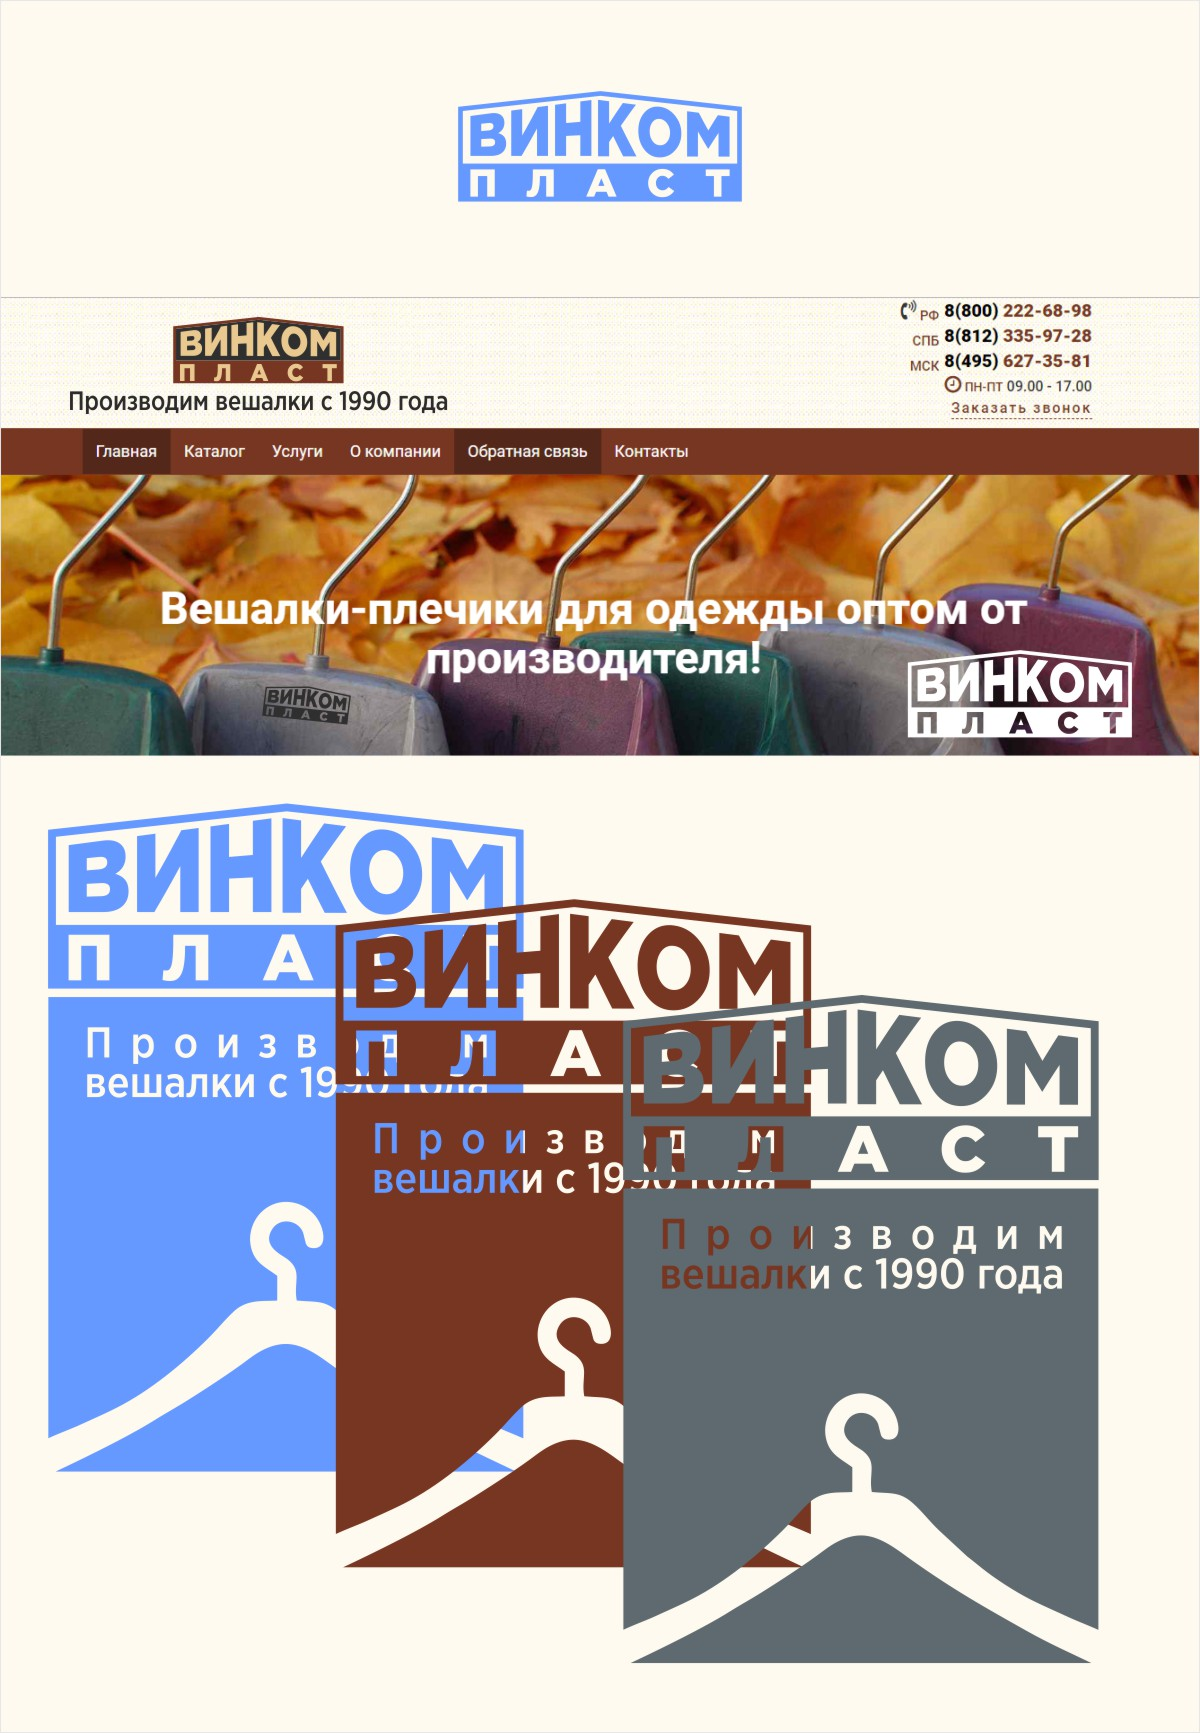 Логотип, фавикон и визитка для компании Винком Пласт  фото f_4585c373bcf233e9.jpg